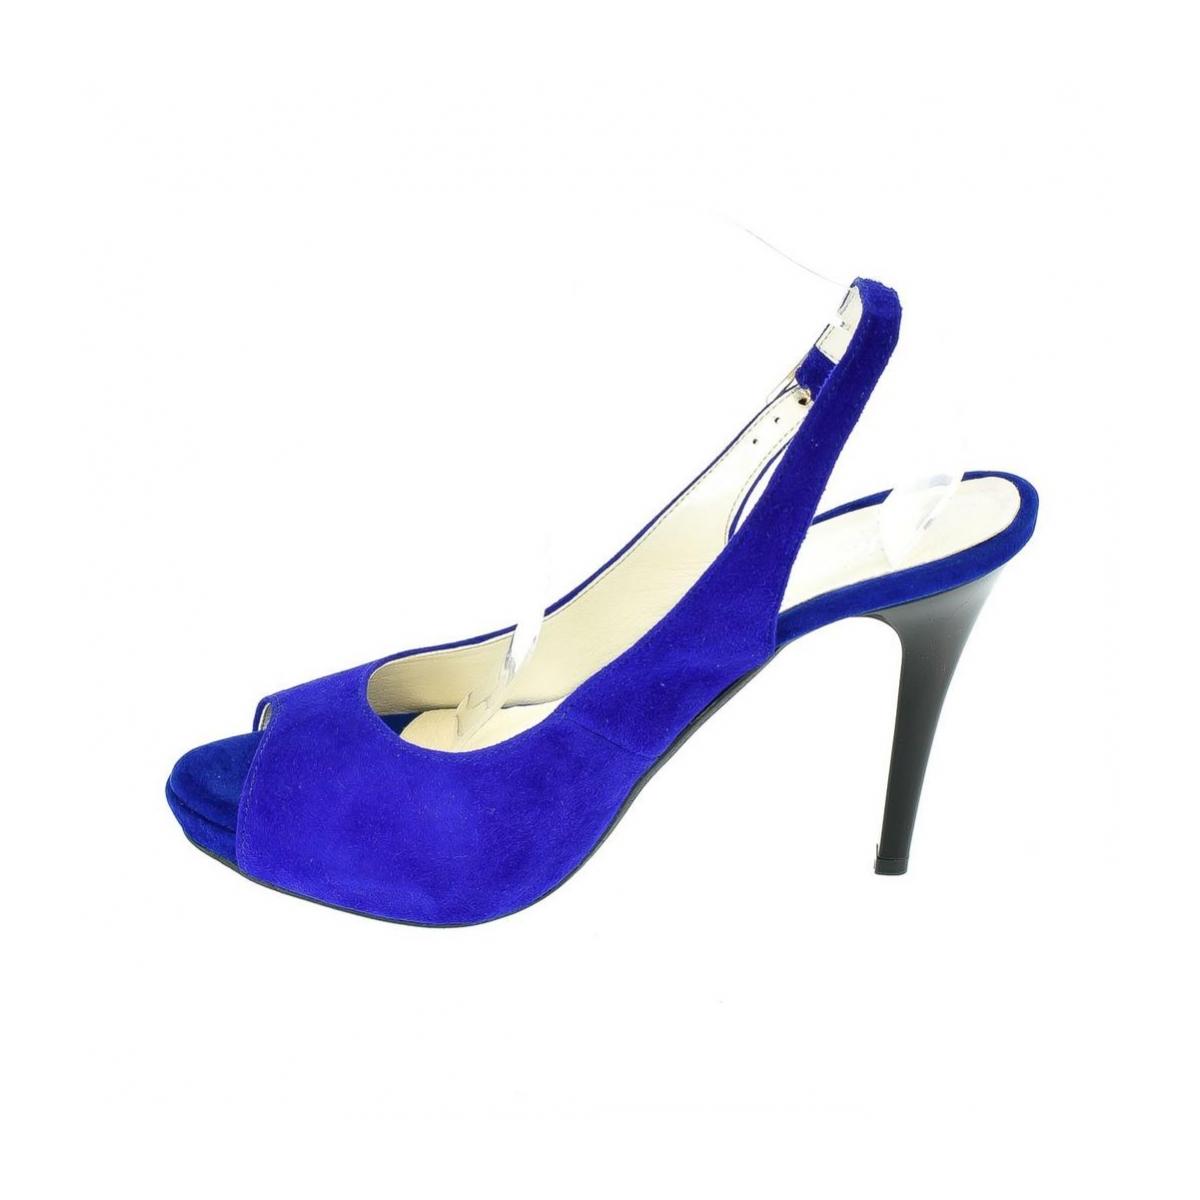 c879a42ddb5d Dámske kožené modré sandále SINNI - 5